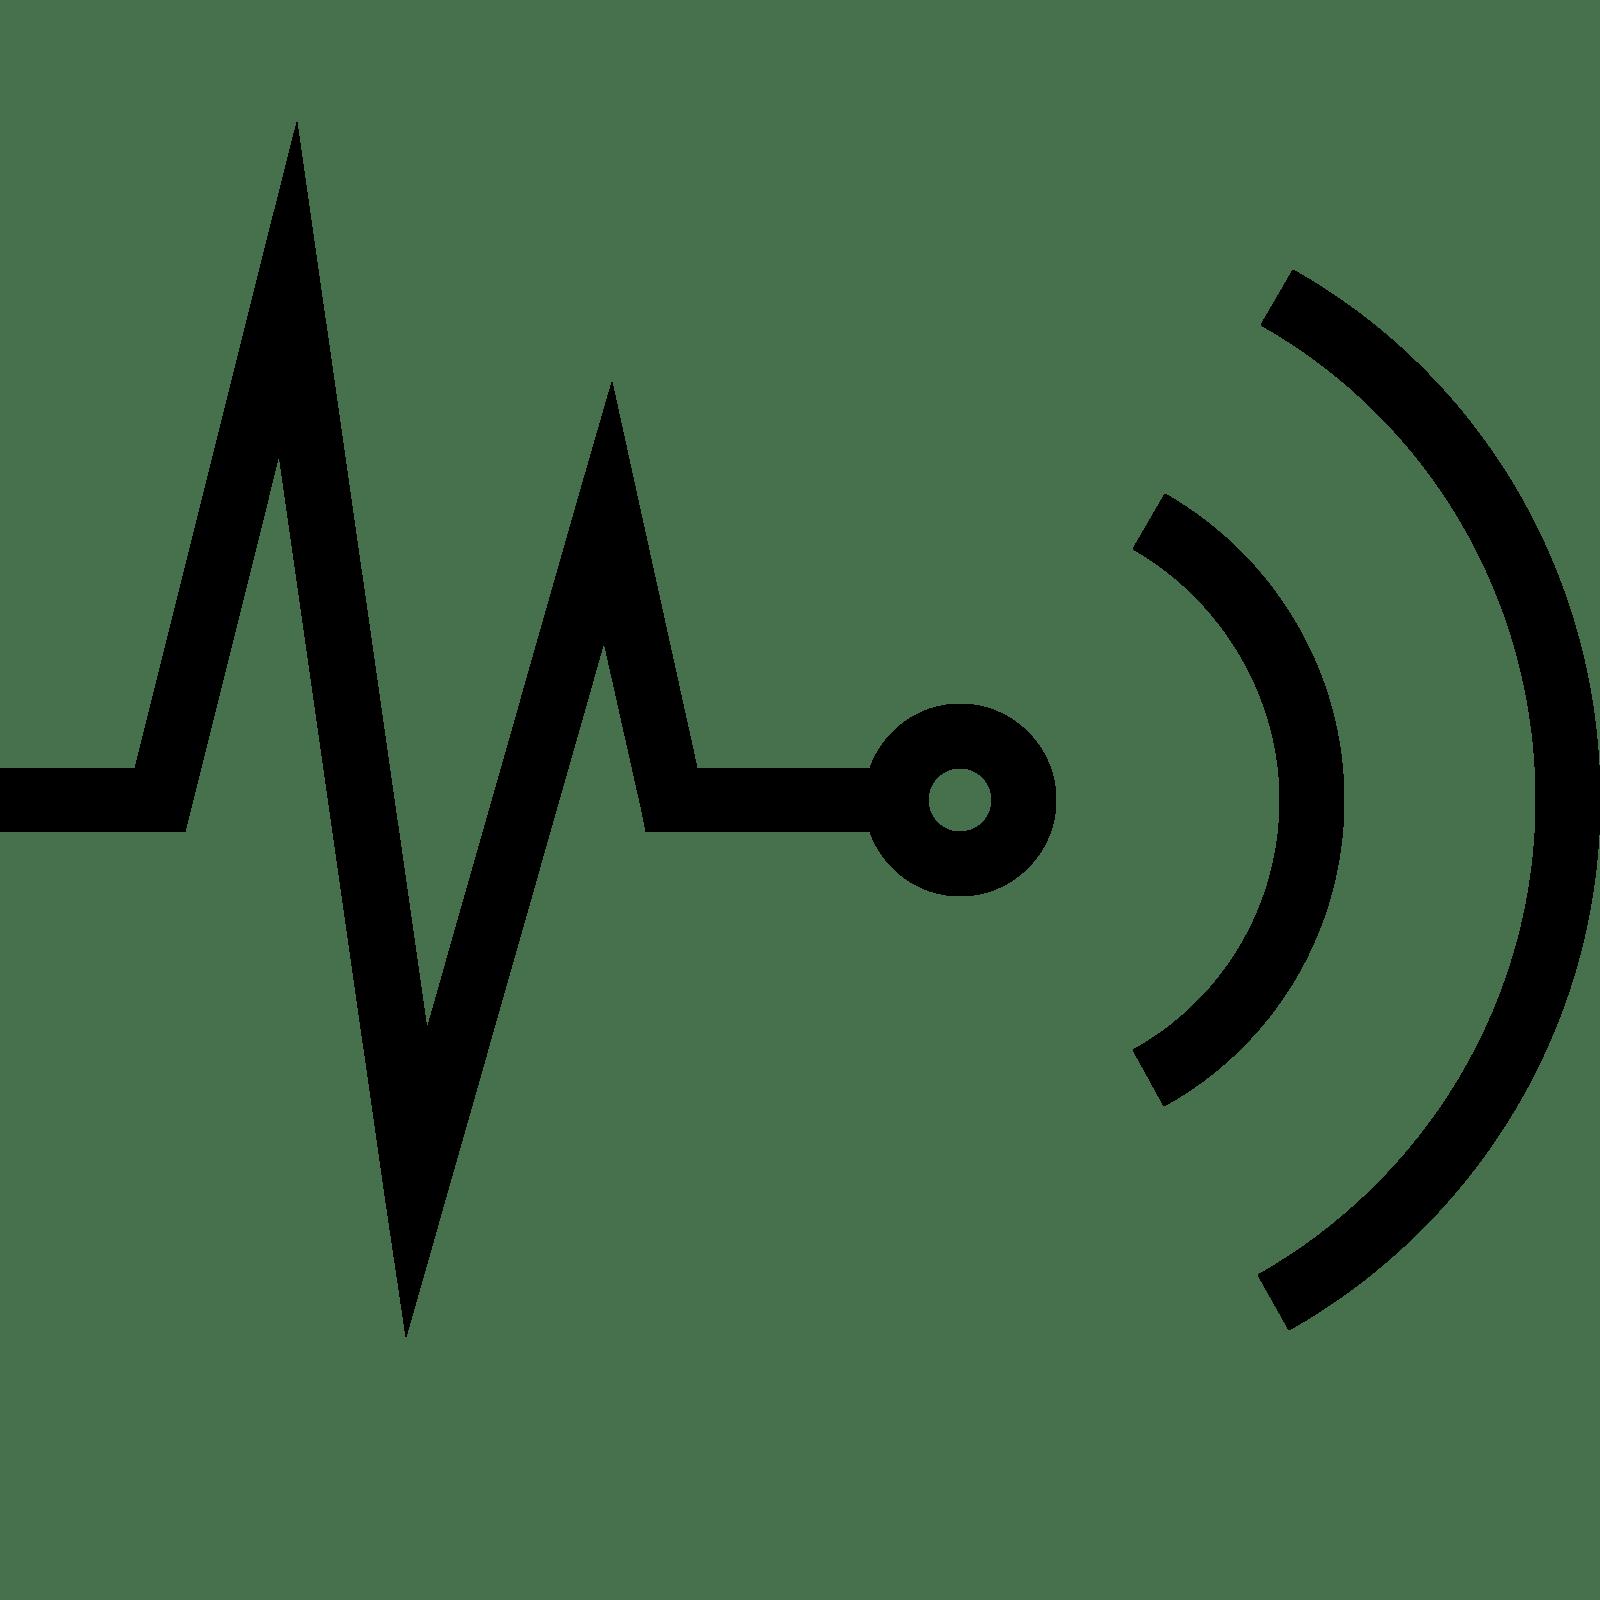 Proximity Sensor Icon